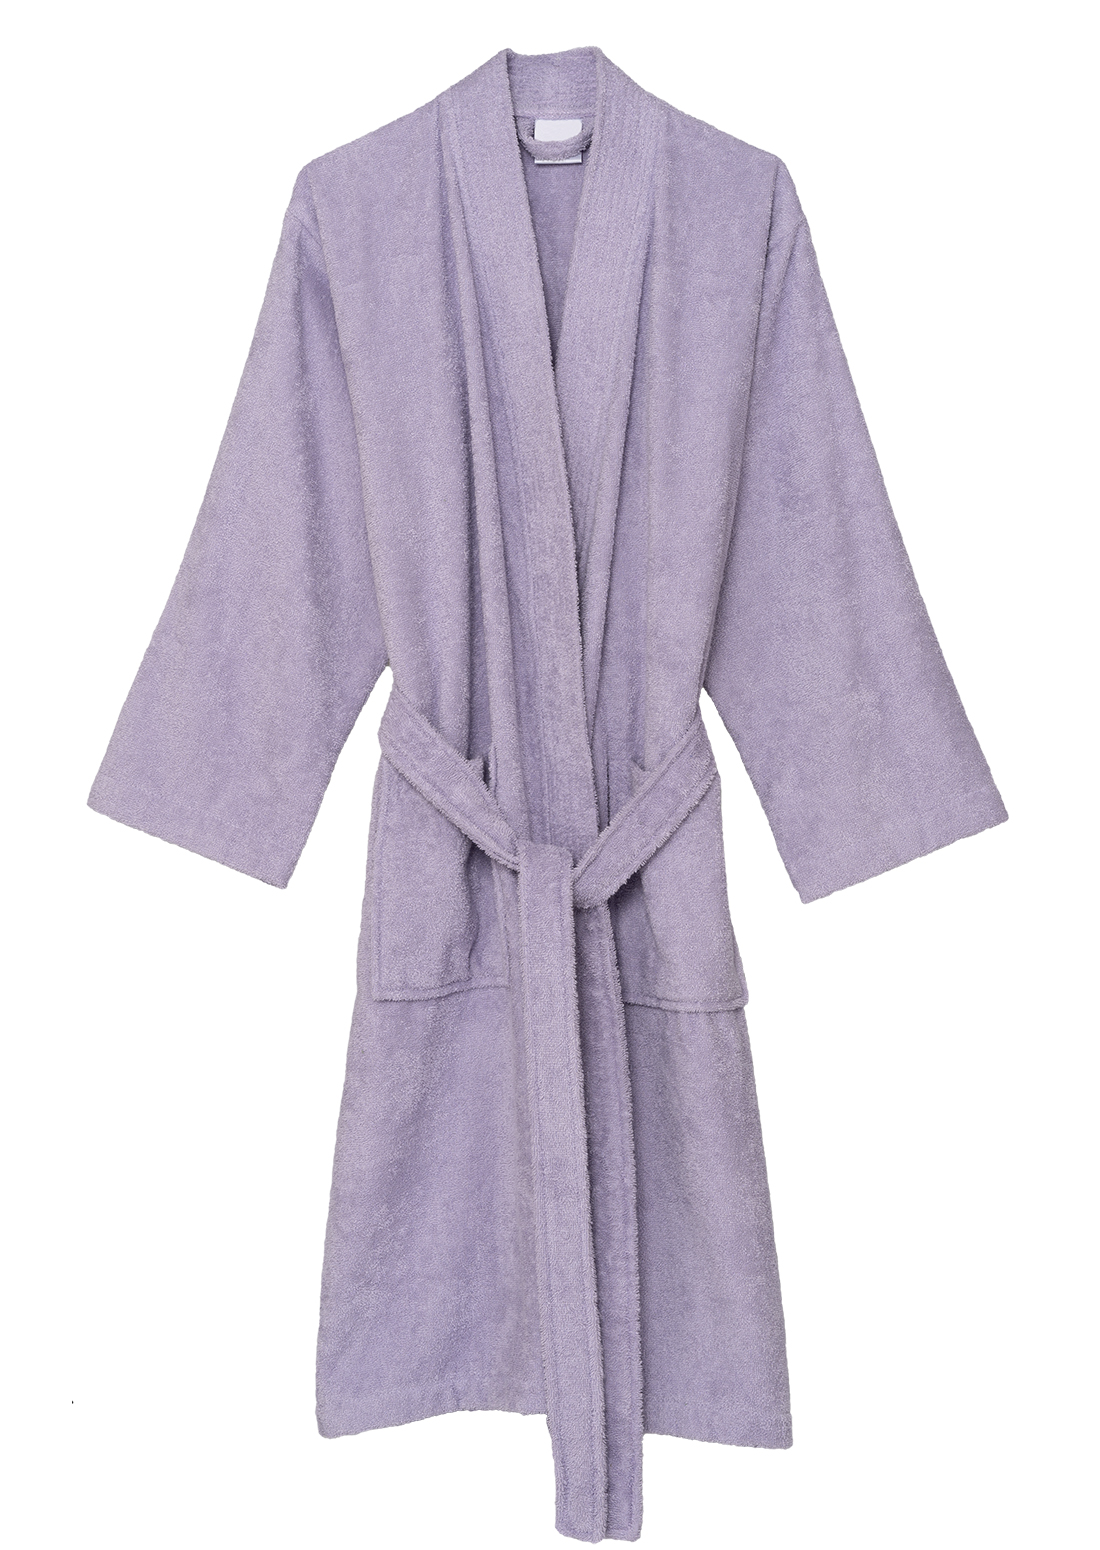 Towelselections Towelselections Women S Robe Turkish Cotton Terry Kimono Bathrobe Walmart Com Walmart Com